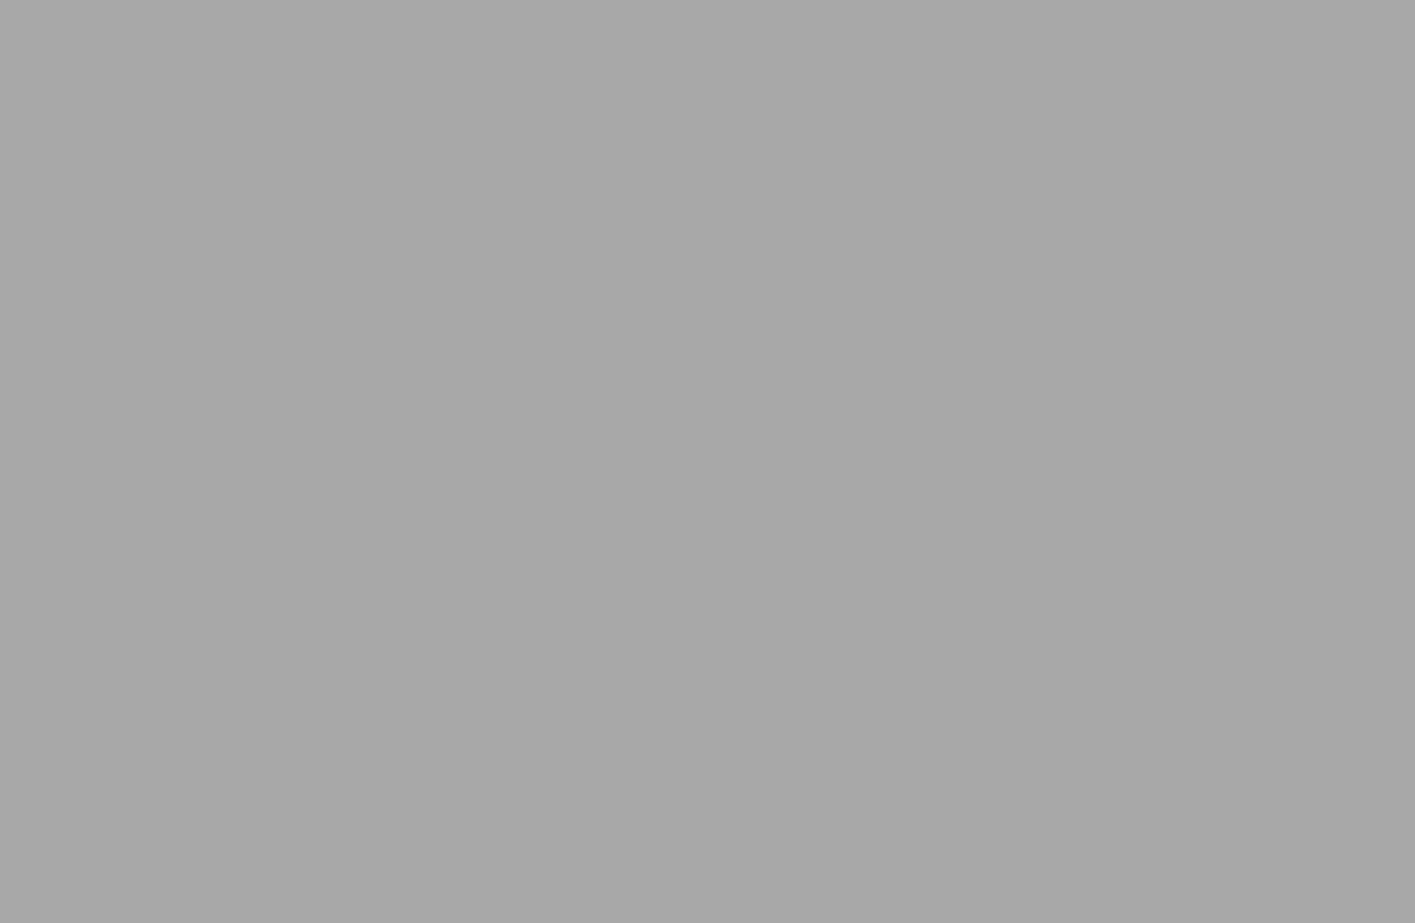 Logos__0016_Honda.png